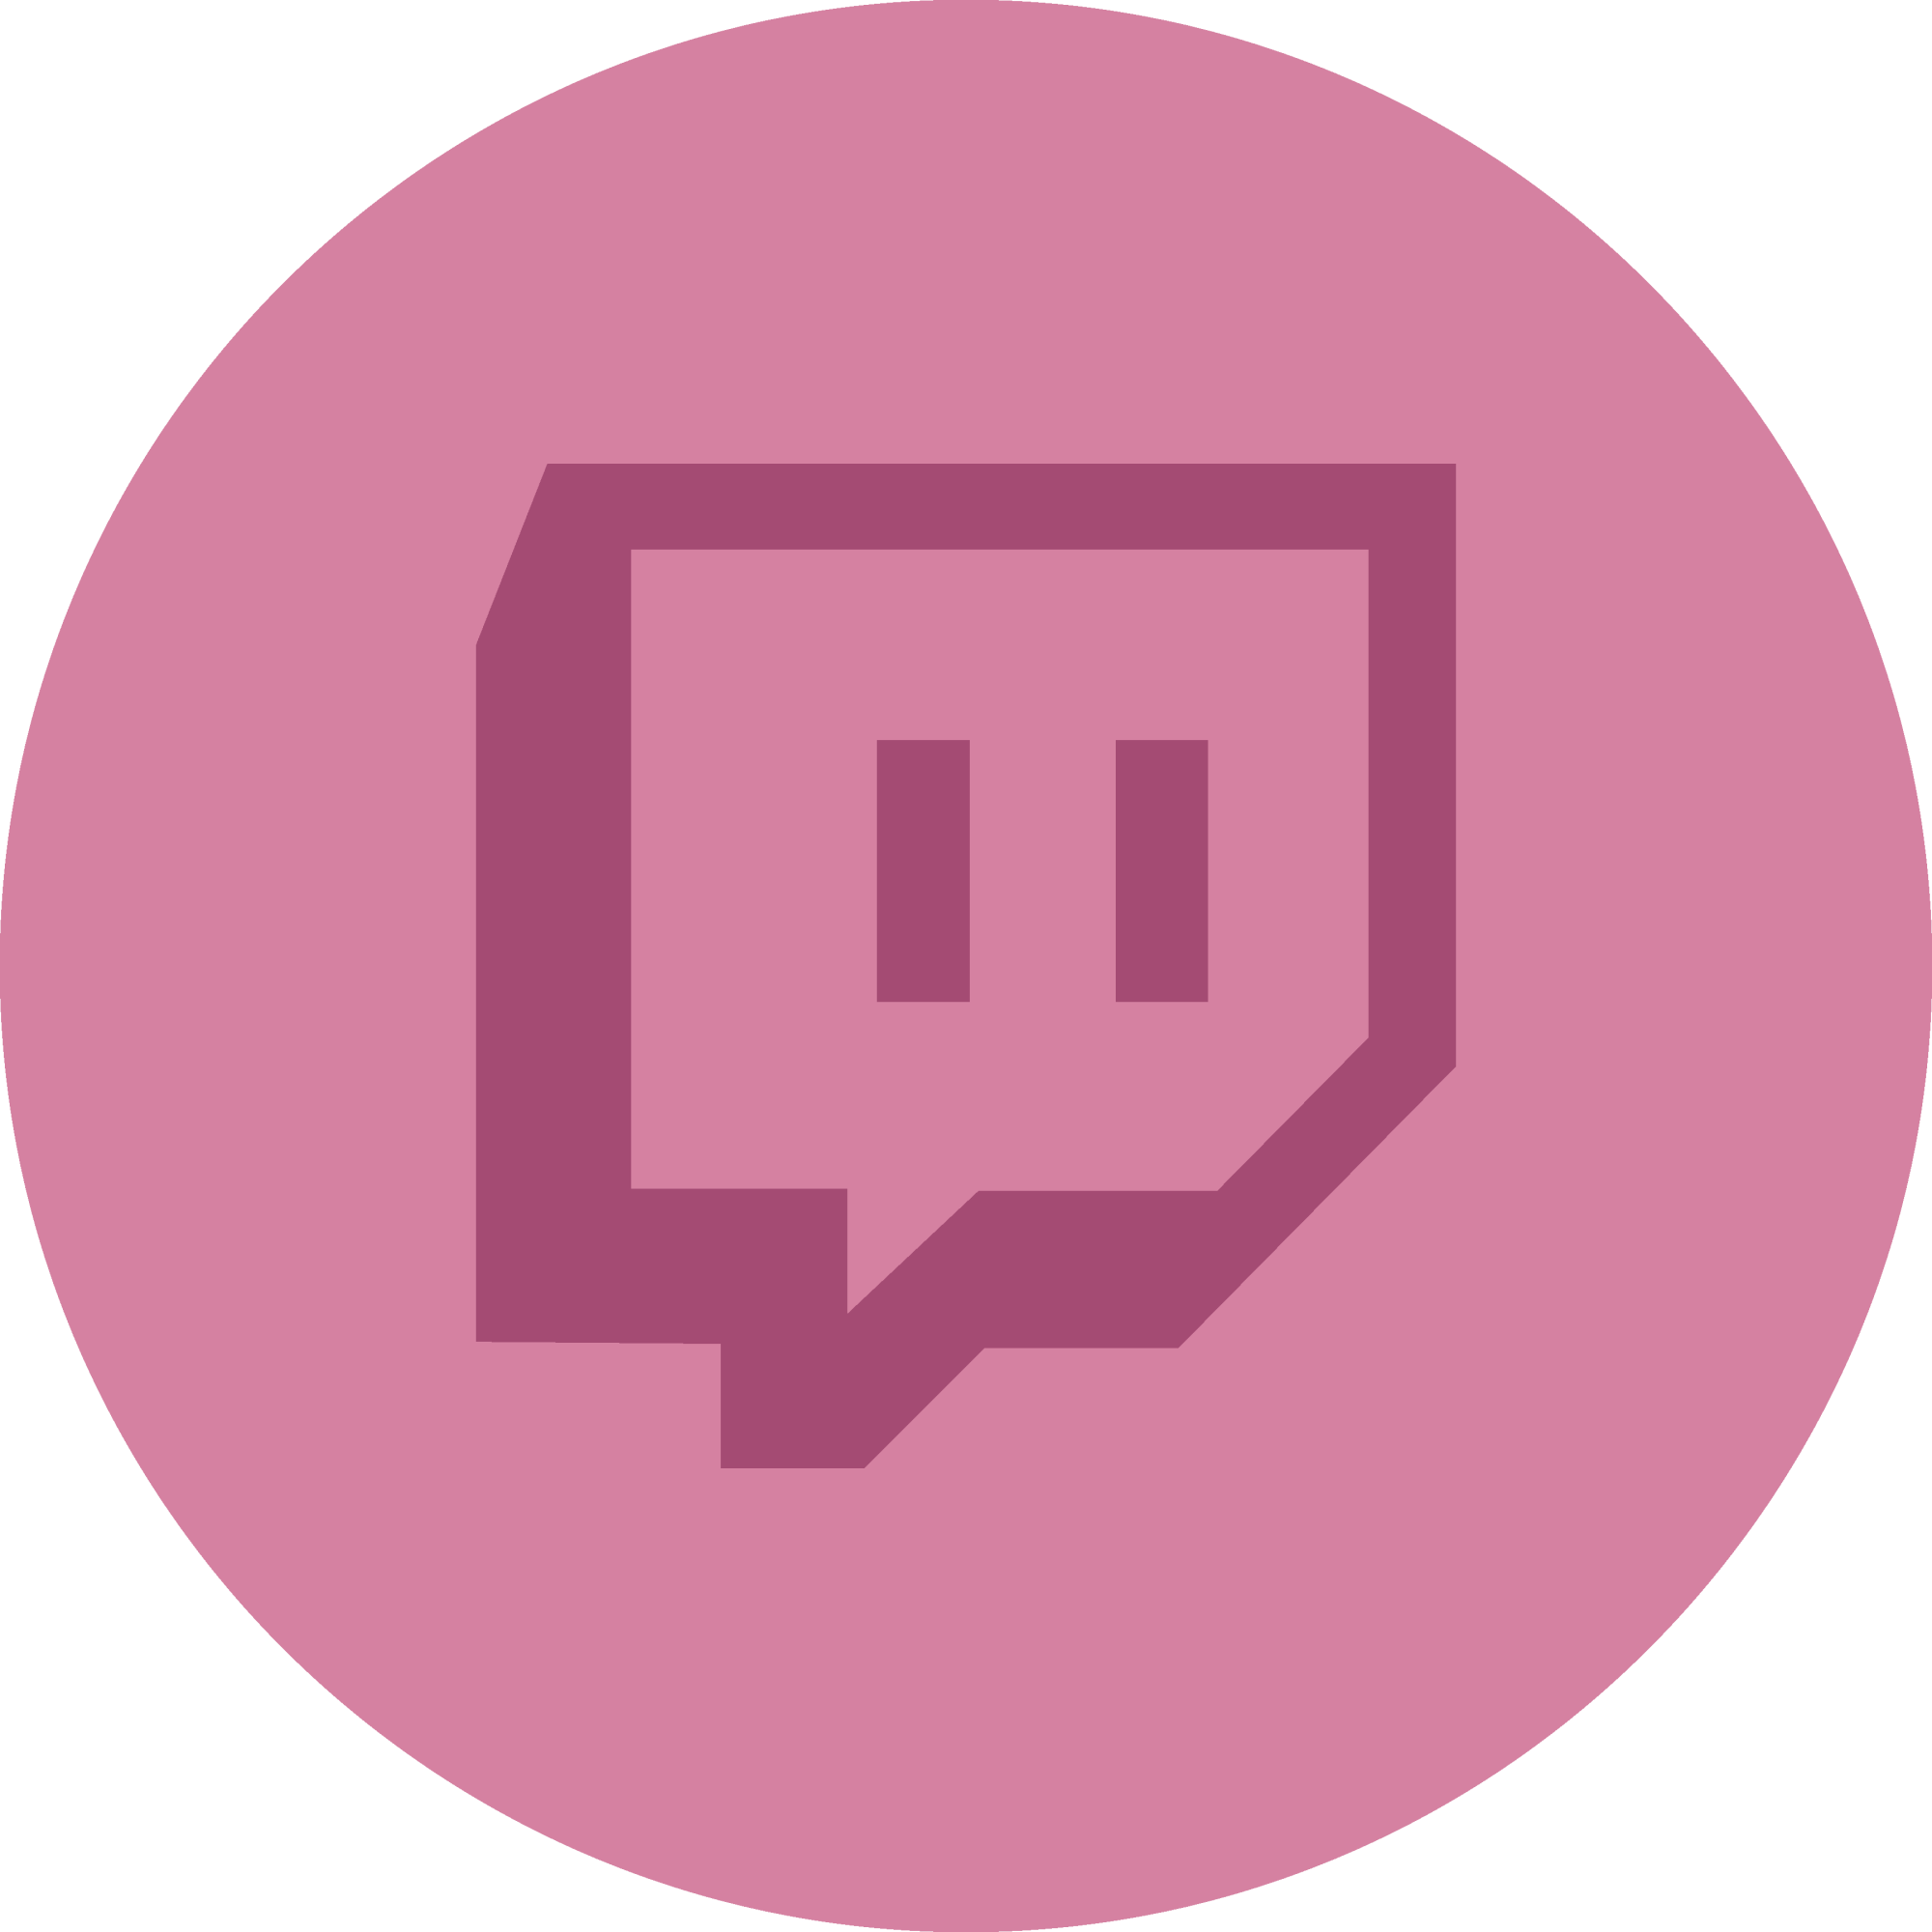 Live Streaming Platform for Gaming